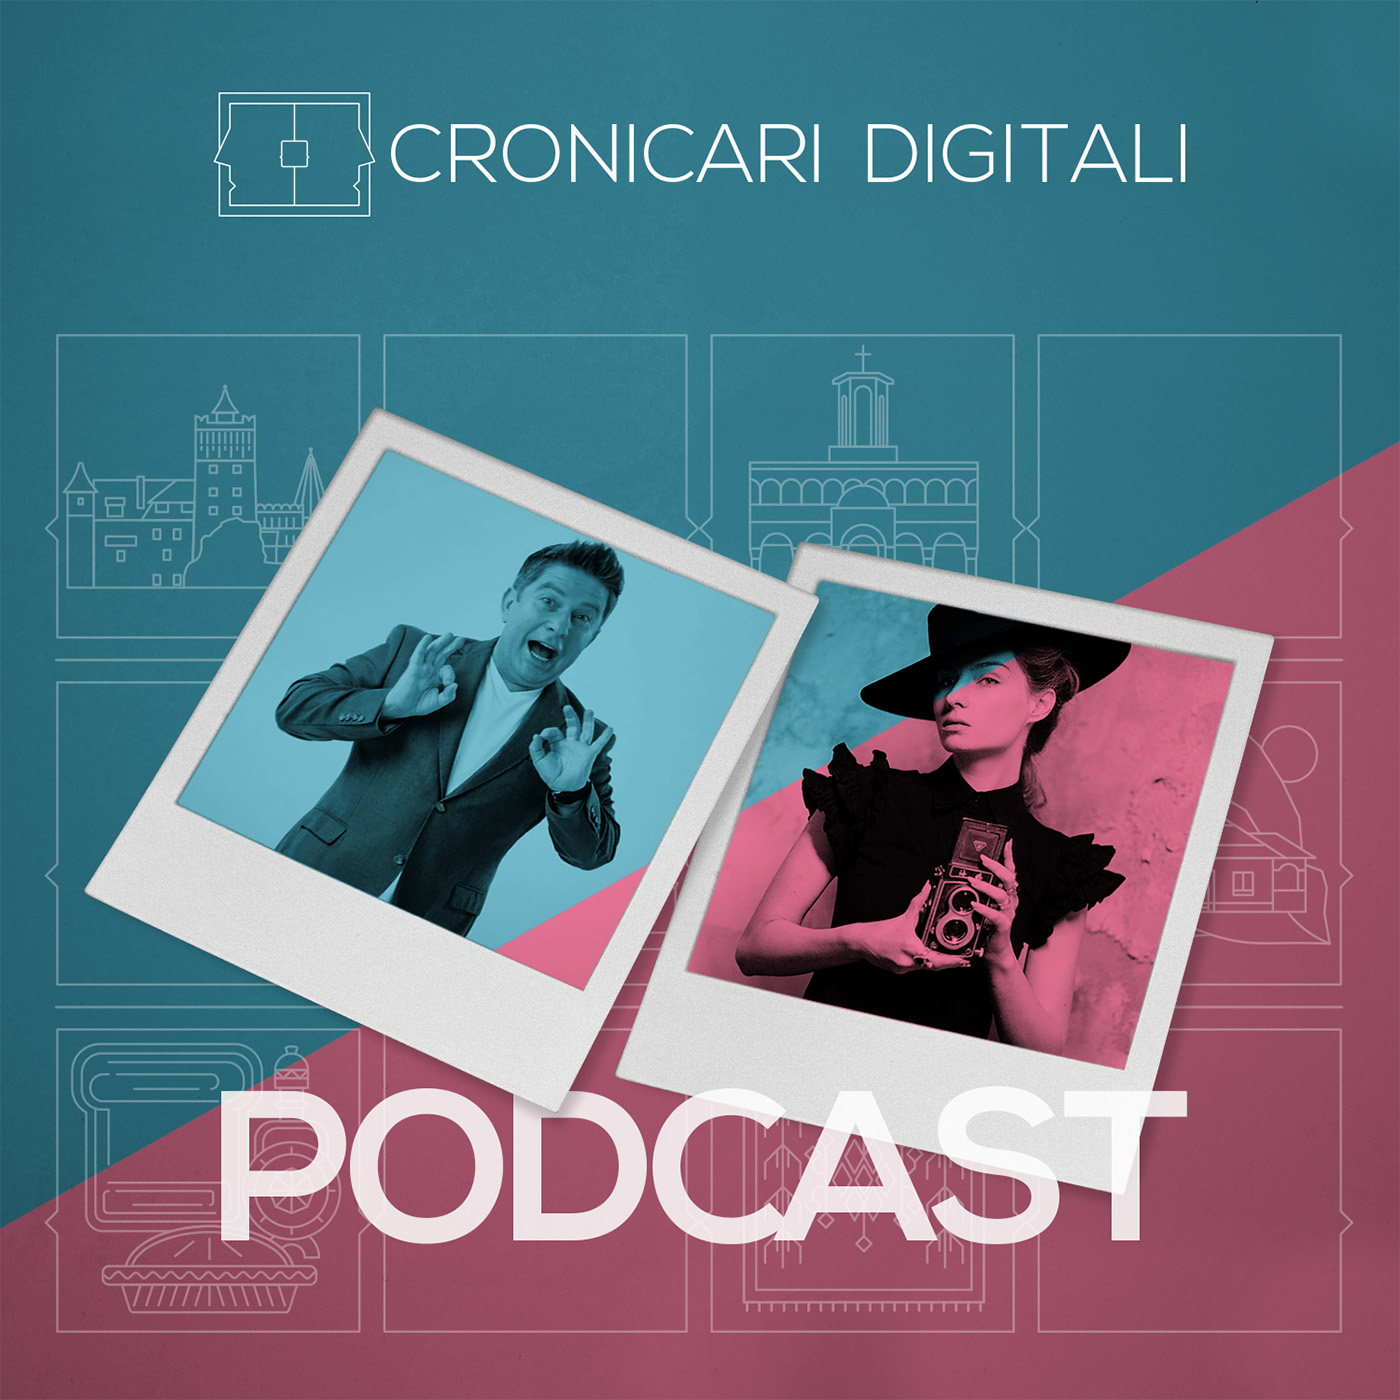 #cronicaridigitali S1 episod 7, Invitați Pavel Bartoș & Christina One, moderator Cristian Șimonca, aka Blogu lu' Otravă